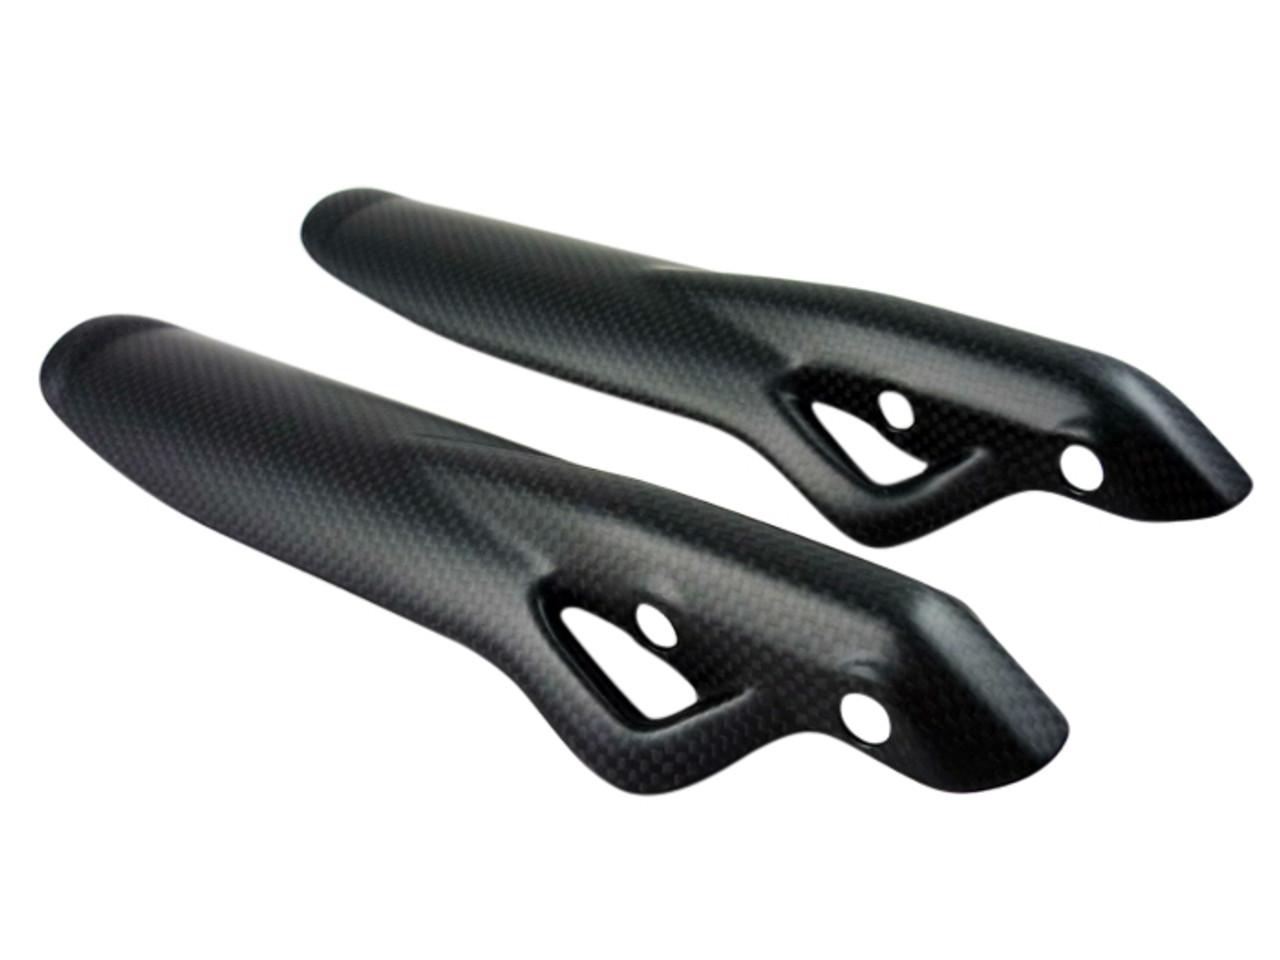 Fork Protectors Style 1 in Glossy Plain Weave Carbon Fiber for Ducati Scrambler